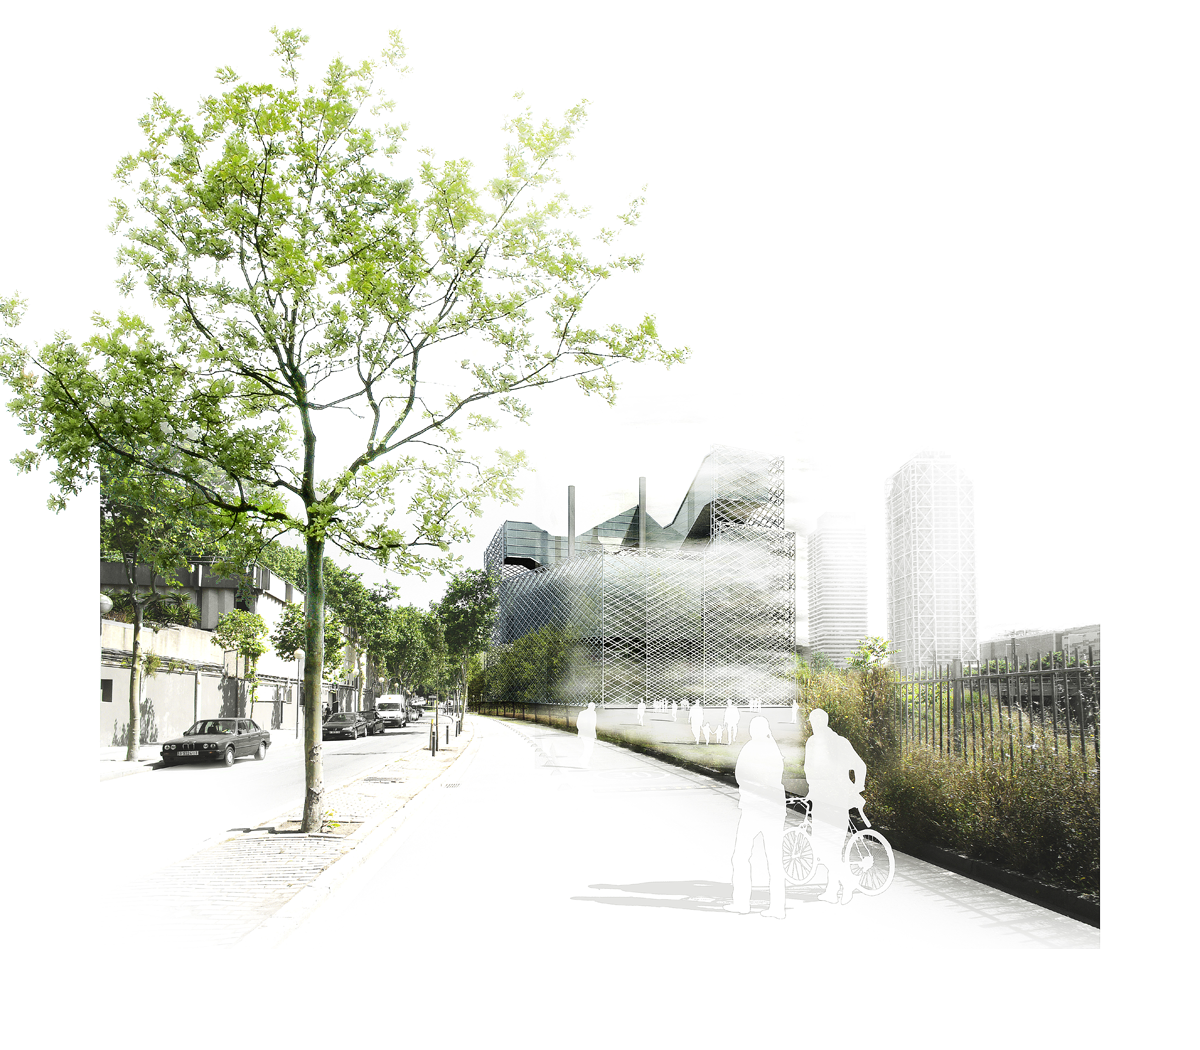 Gallery of prothofactory marta garcia orte aaron for Garden design visualiser